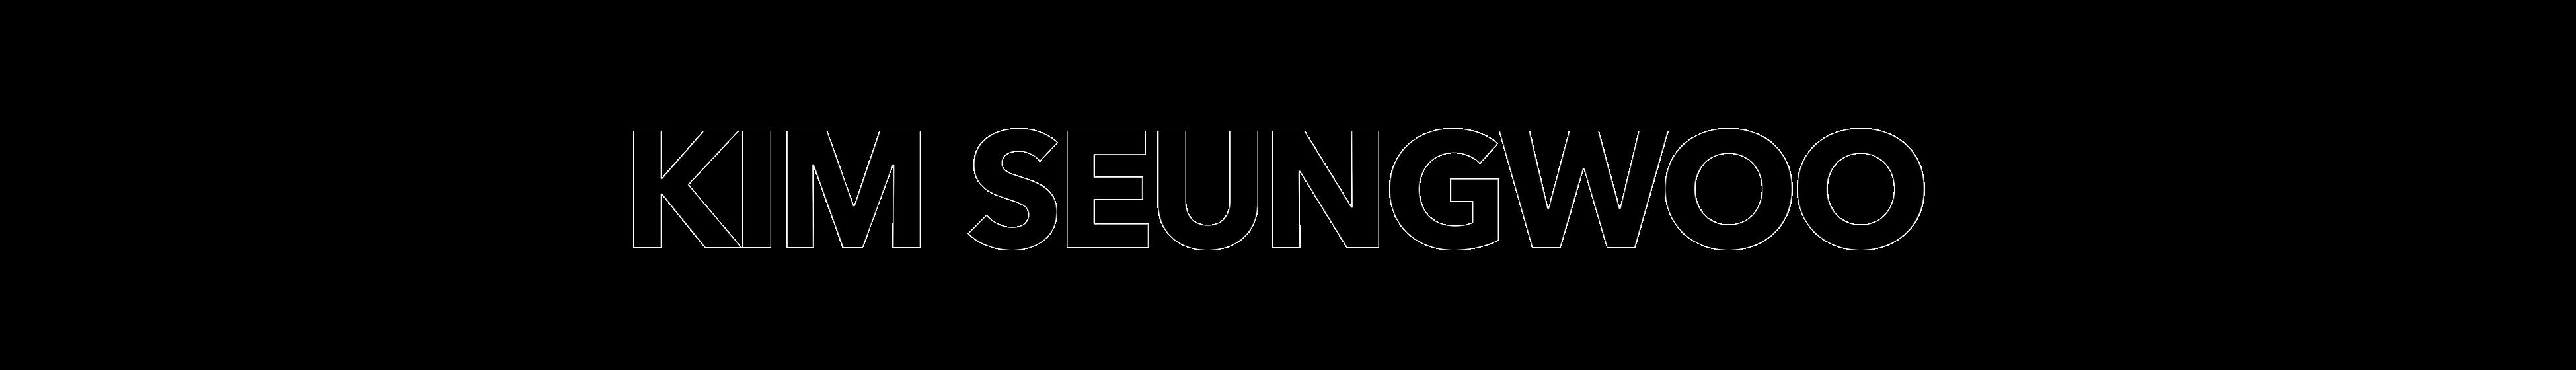 KIM SEUNGWOO